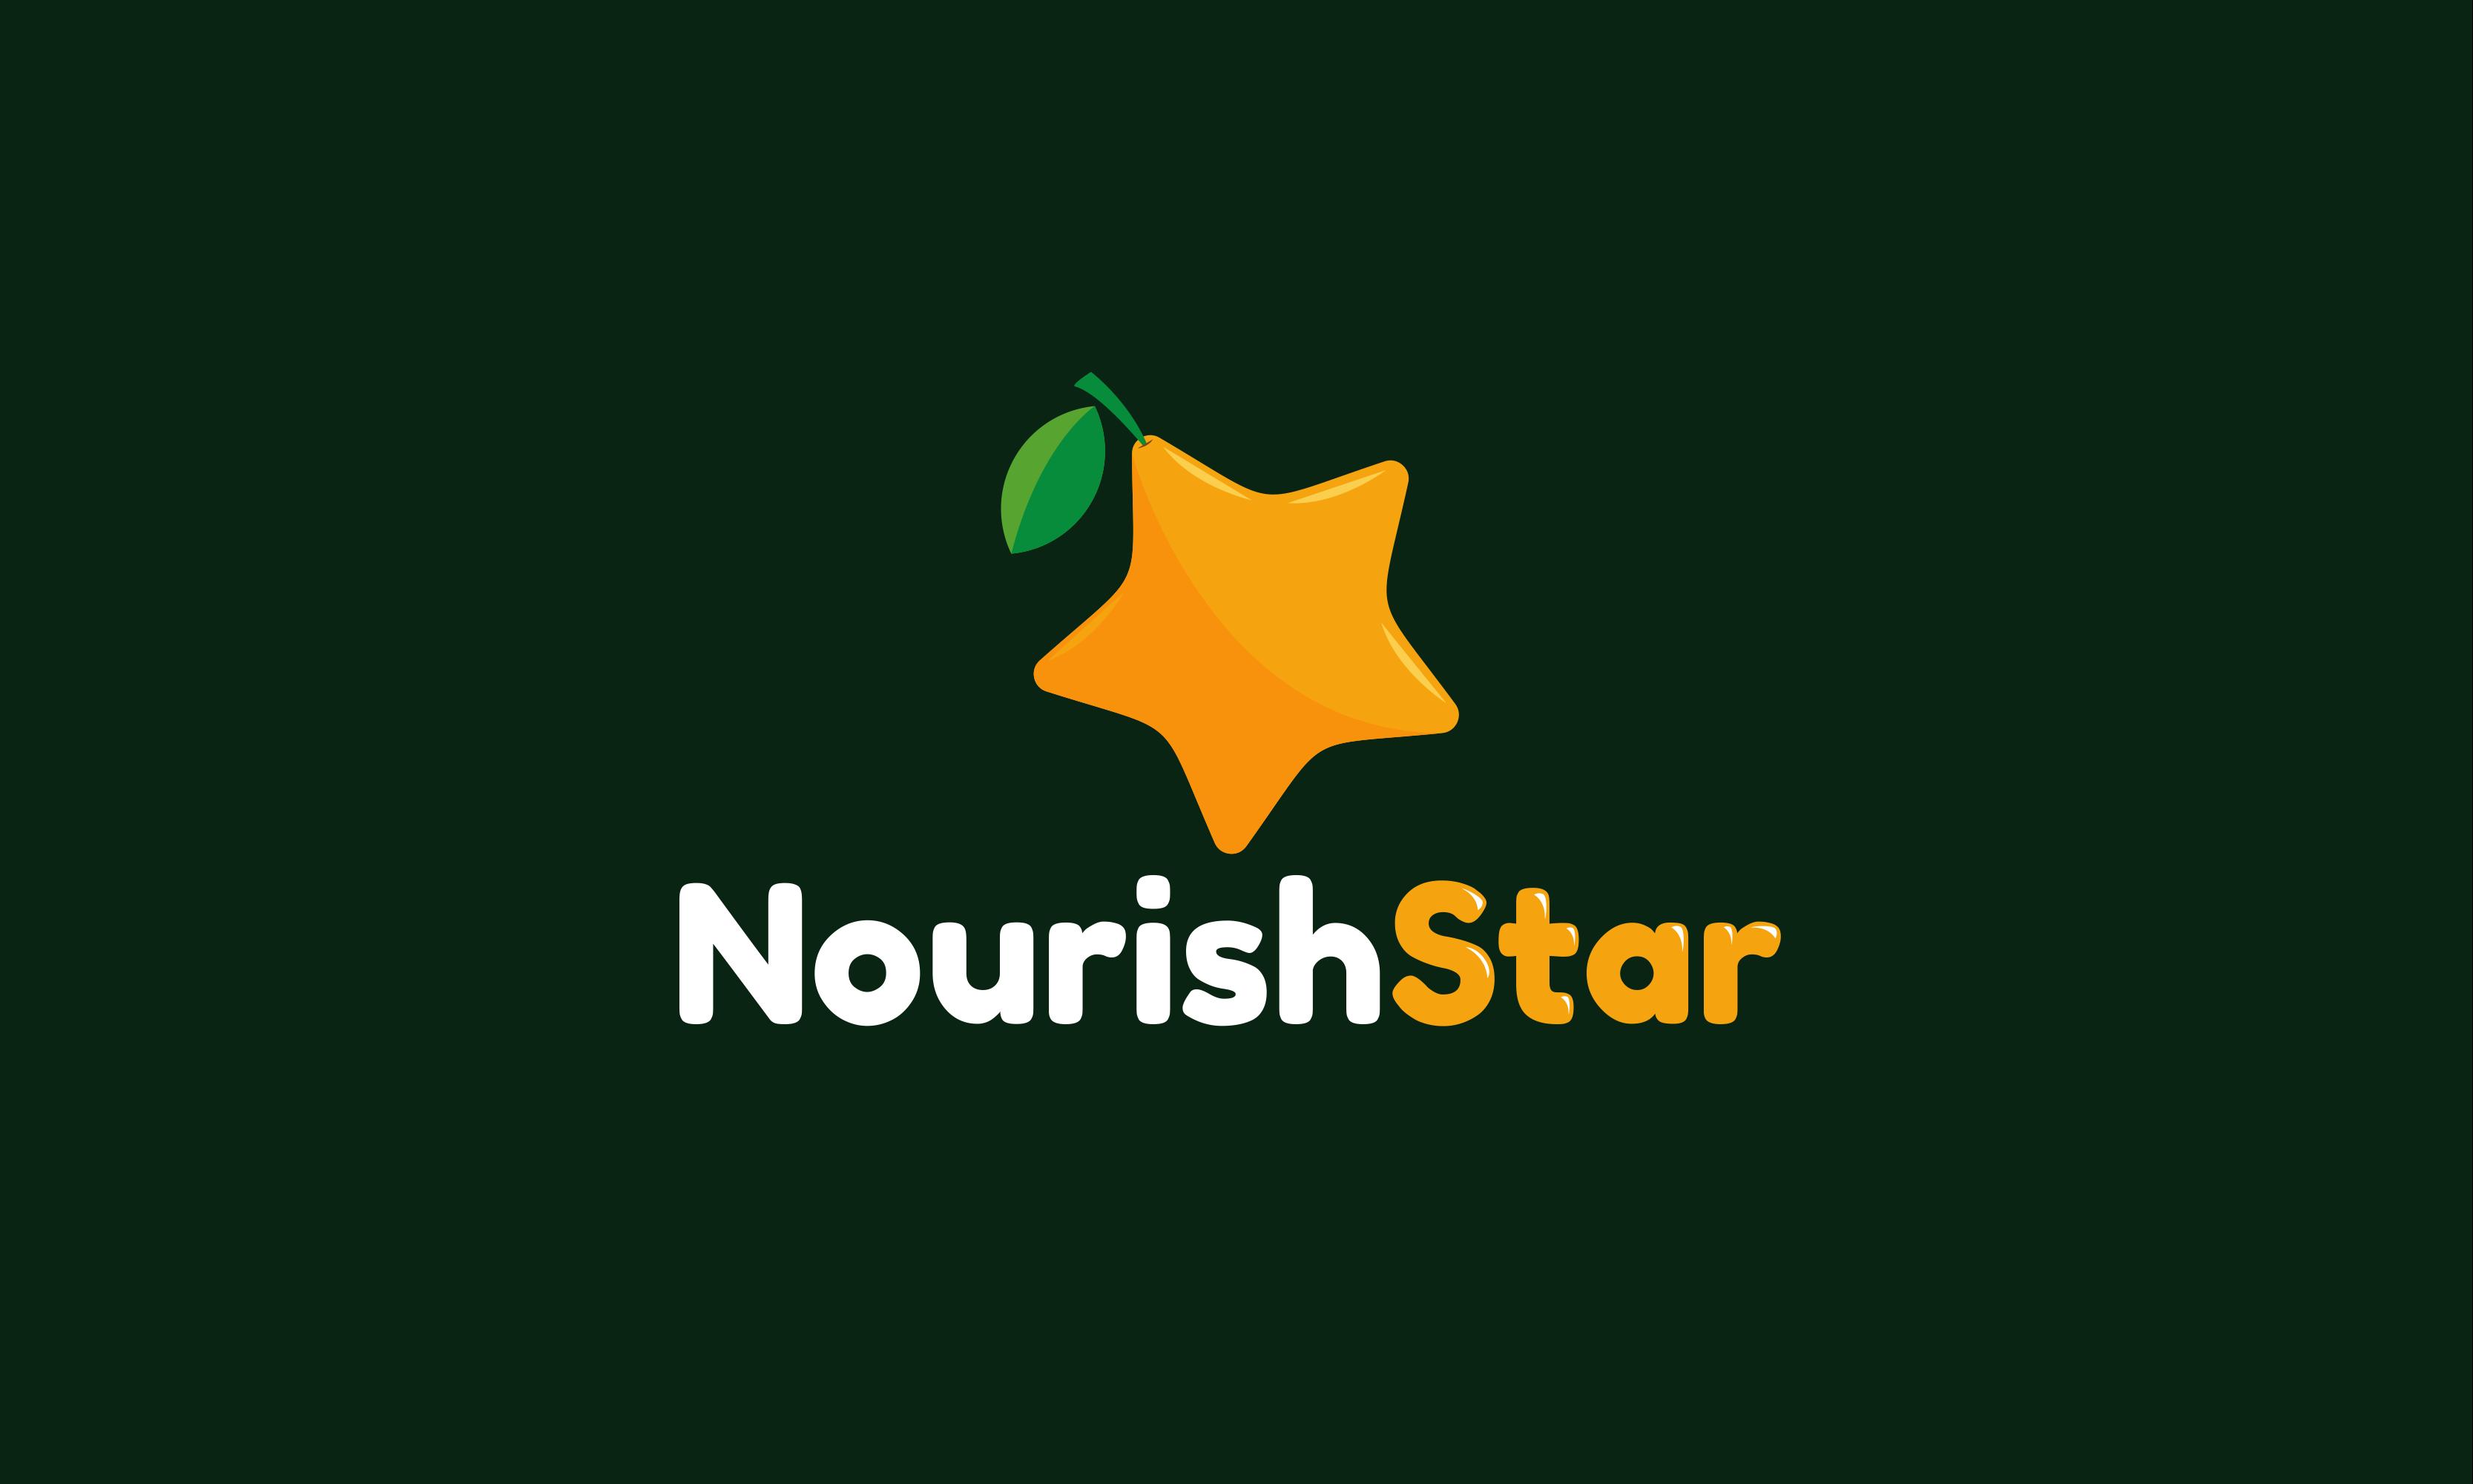 Nourishstar